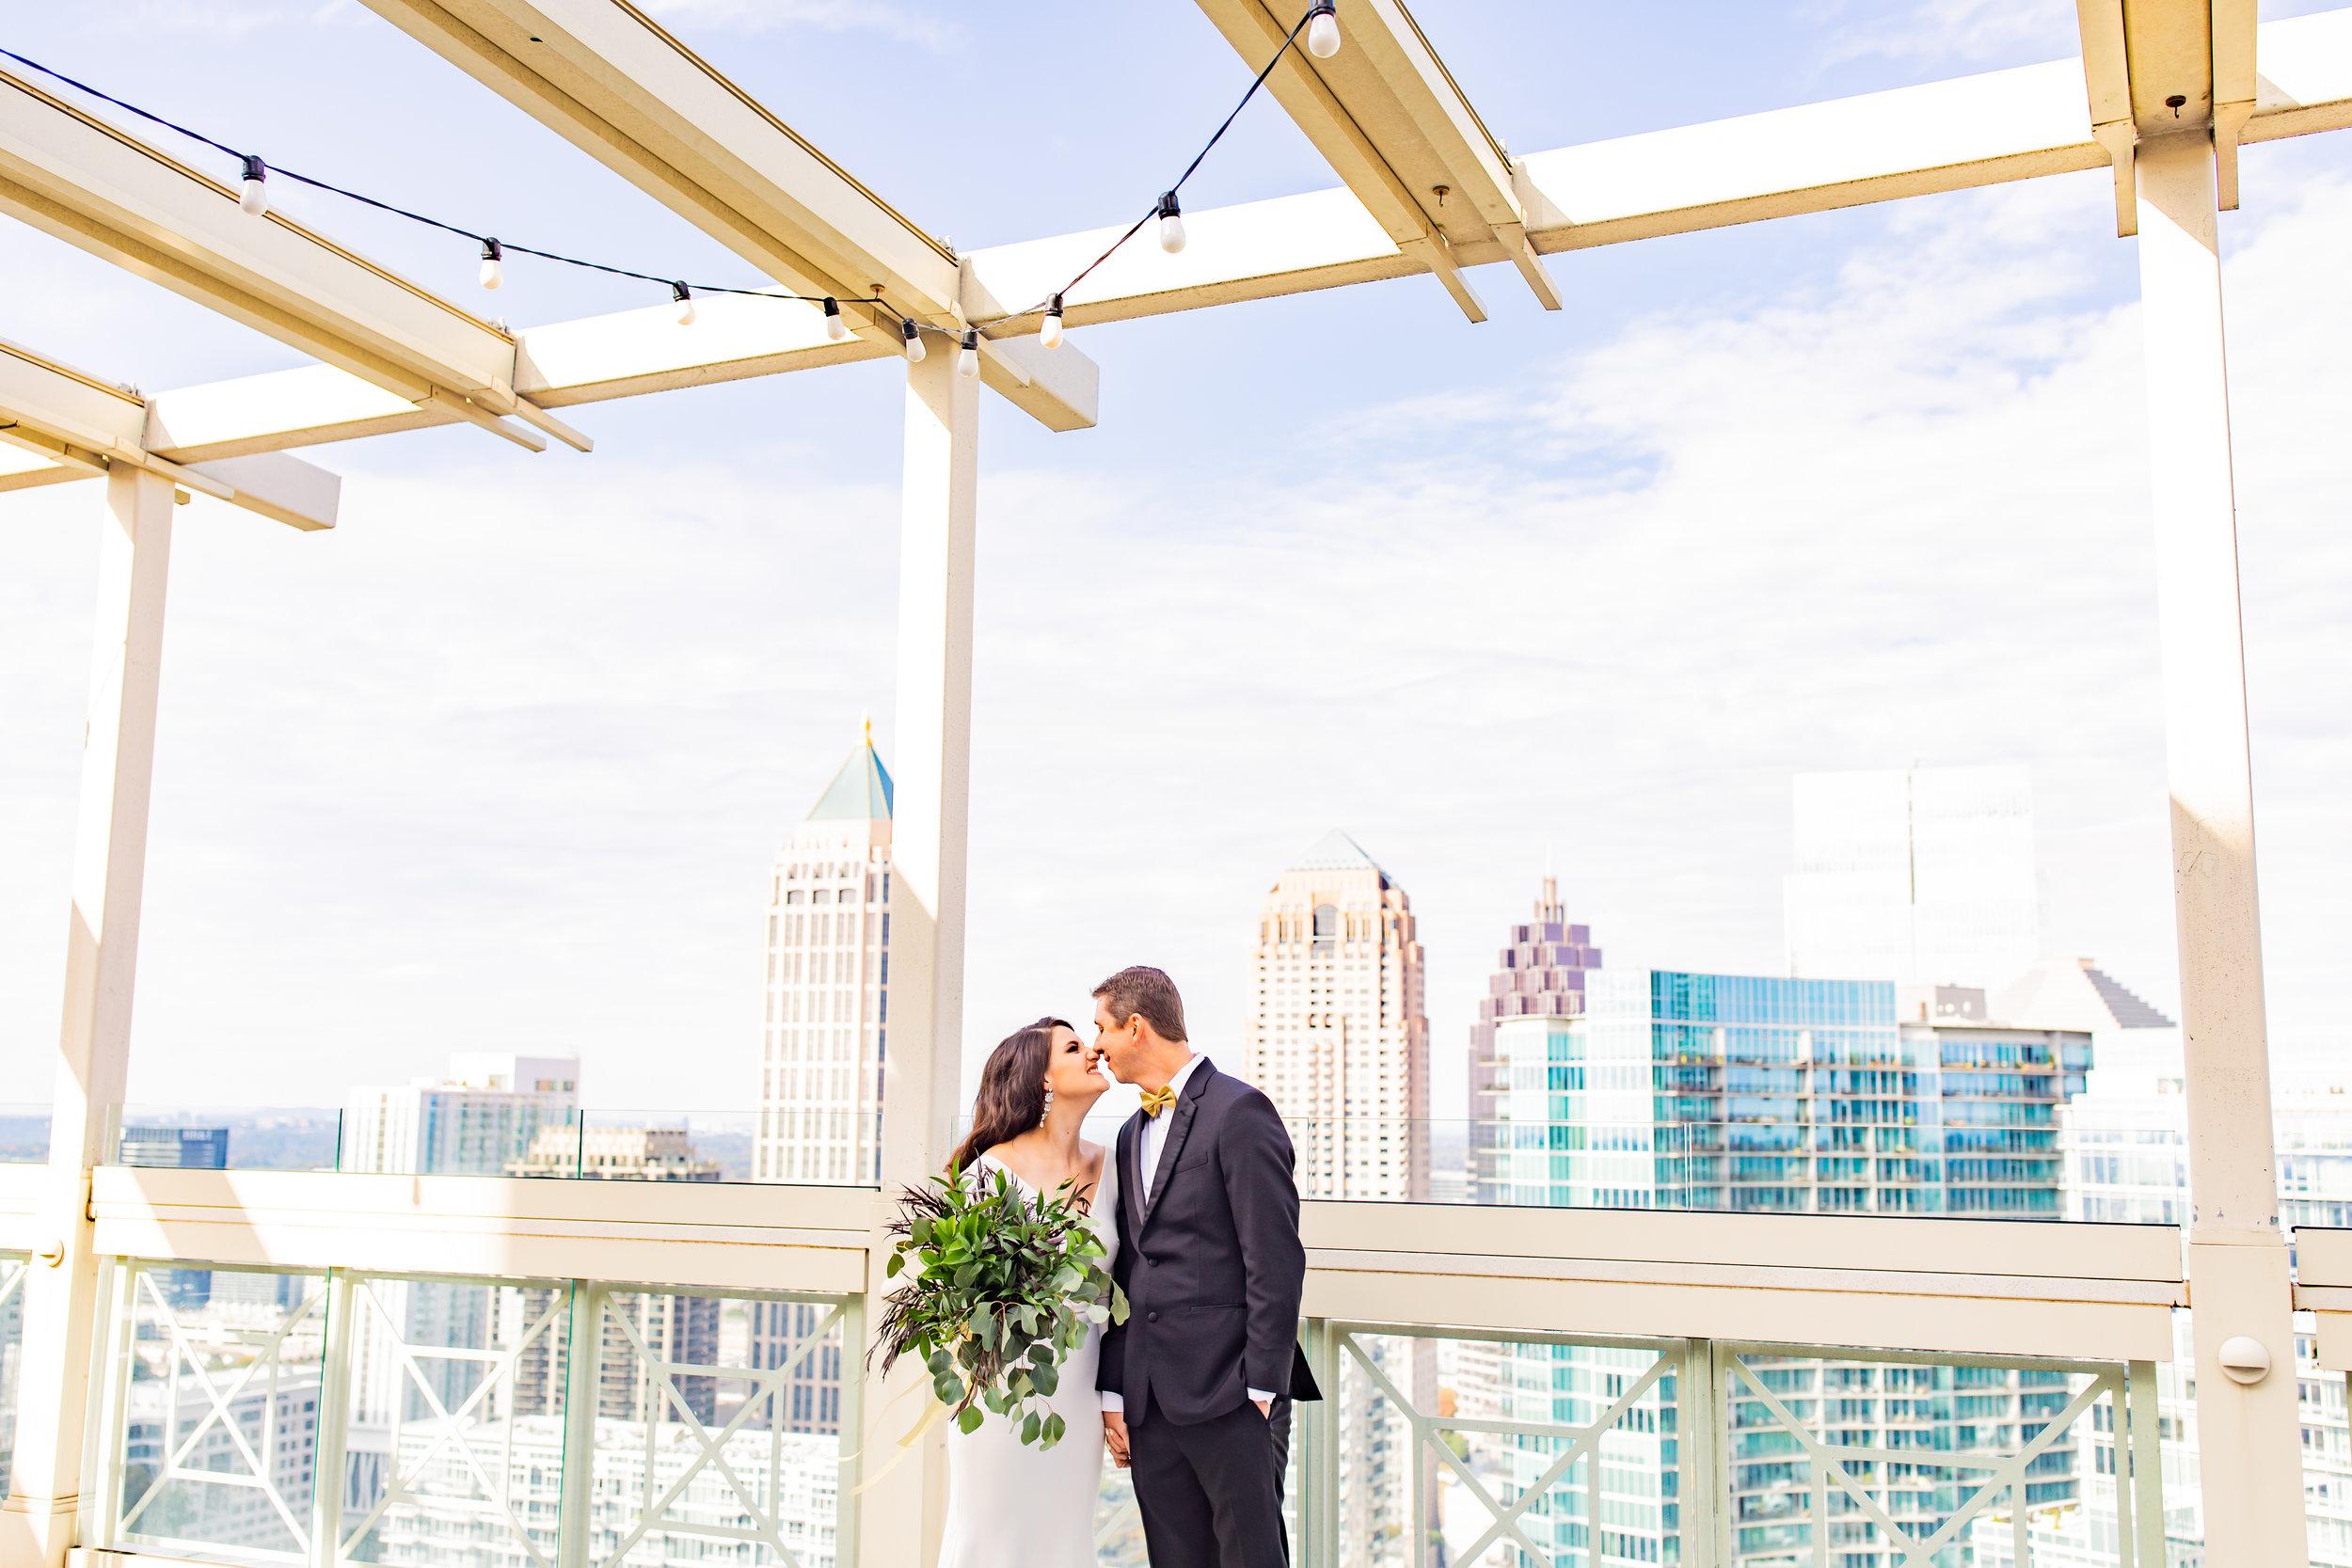 Wedding_Atlanta_Emily_Lester_Photography-93.jpg